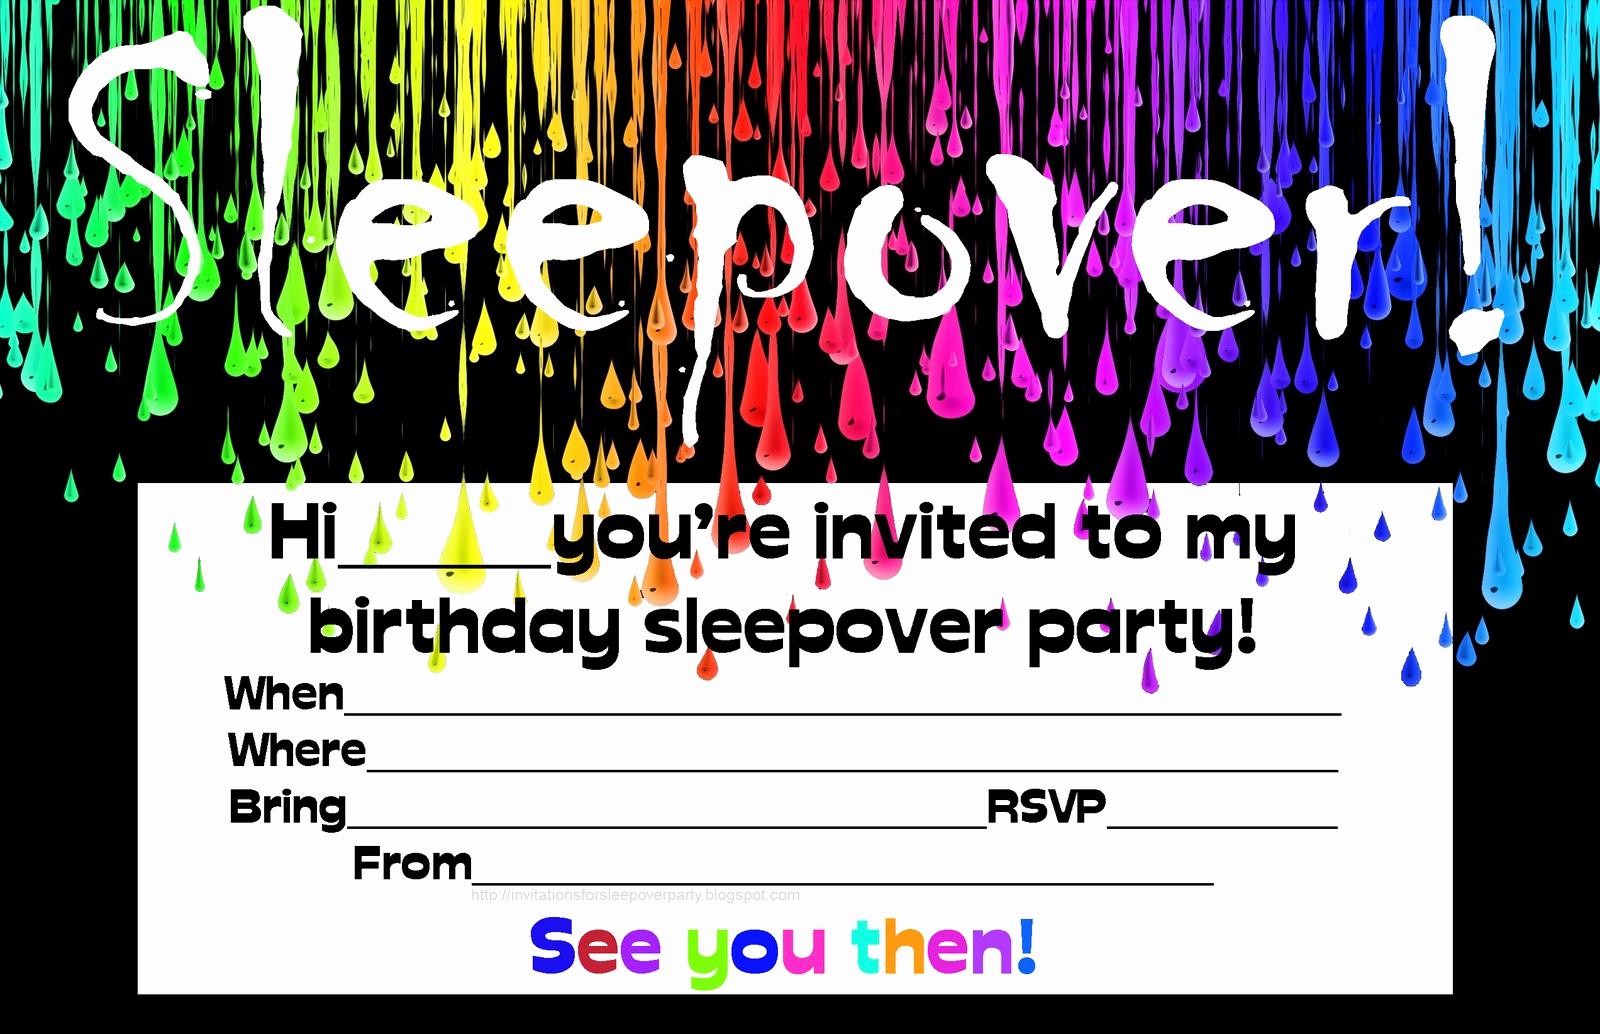 13th Birthday Invitation Ideas Inspirational 13th Birthday Party Invitation Ideas – Free Printable